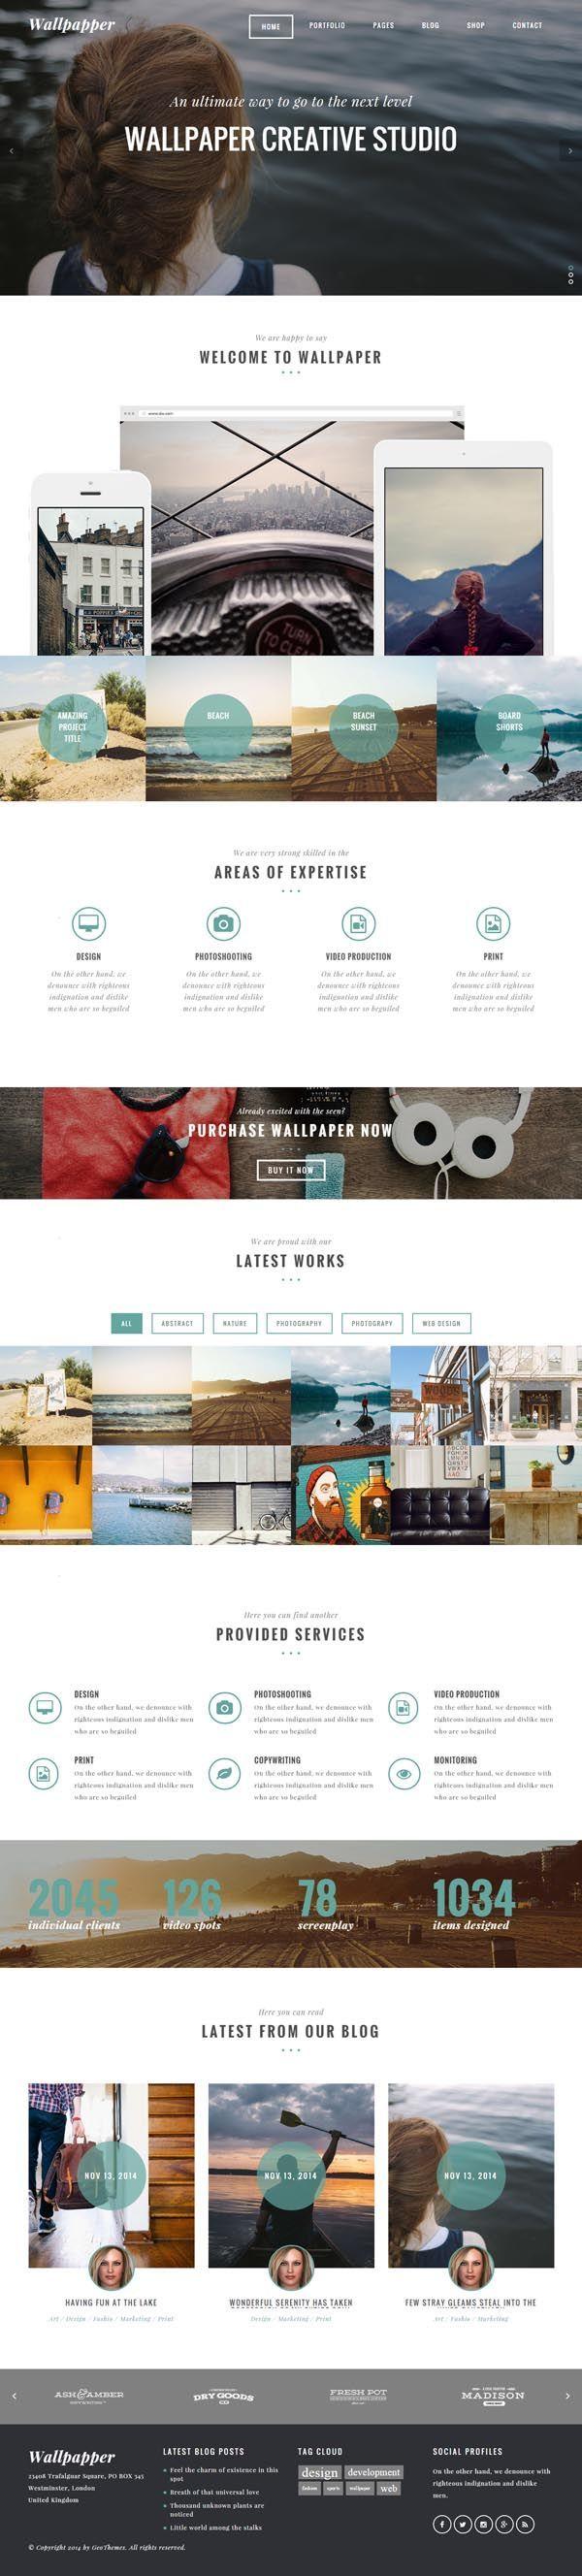 105 best WordPress Themes images on Pinterest   Website designs ...